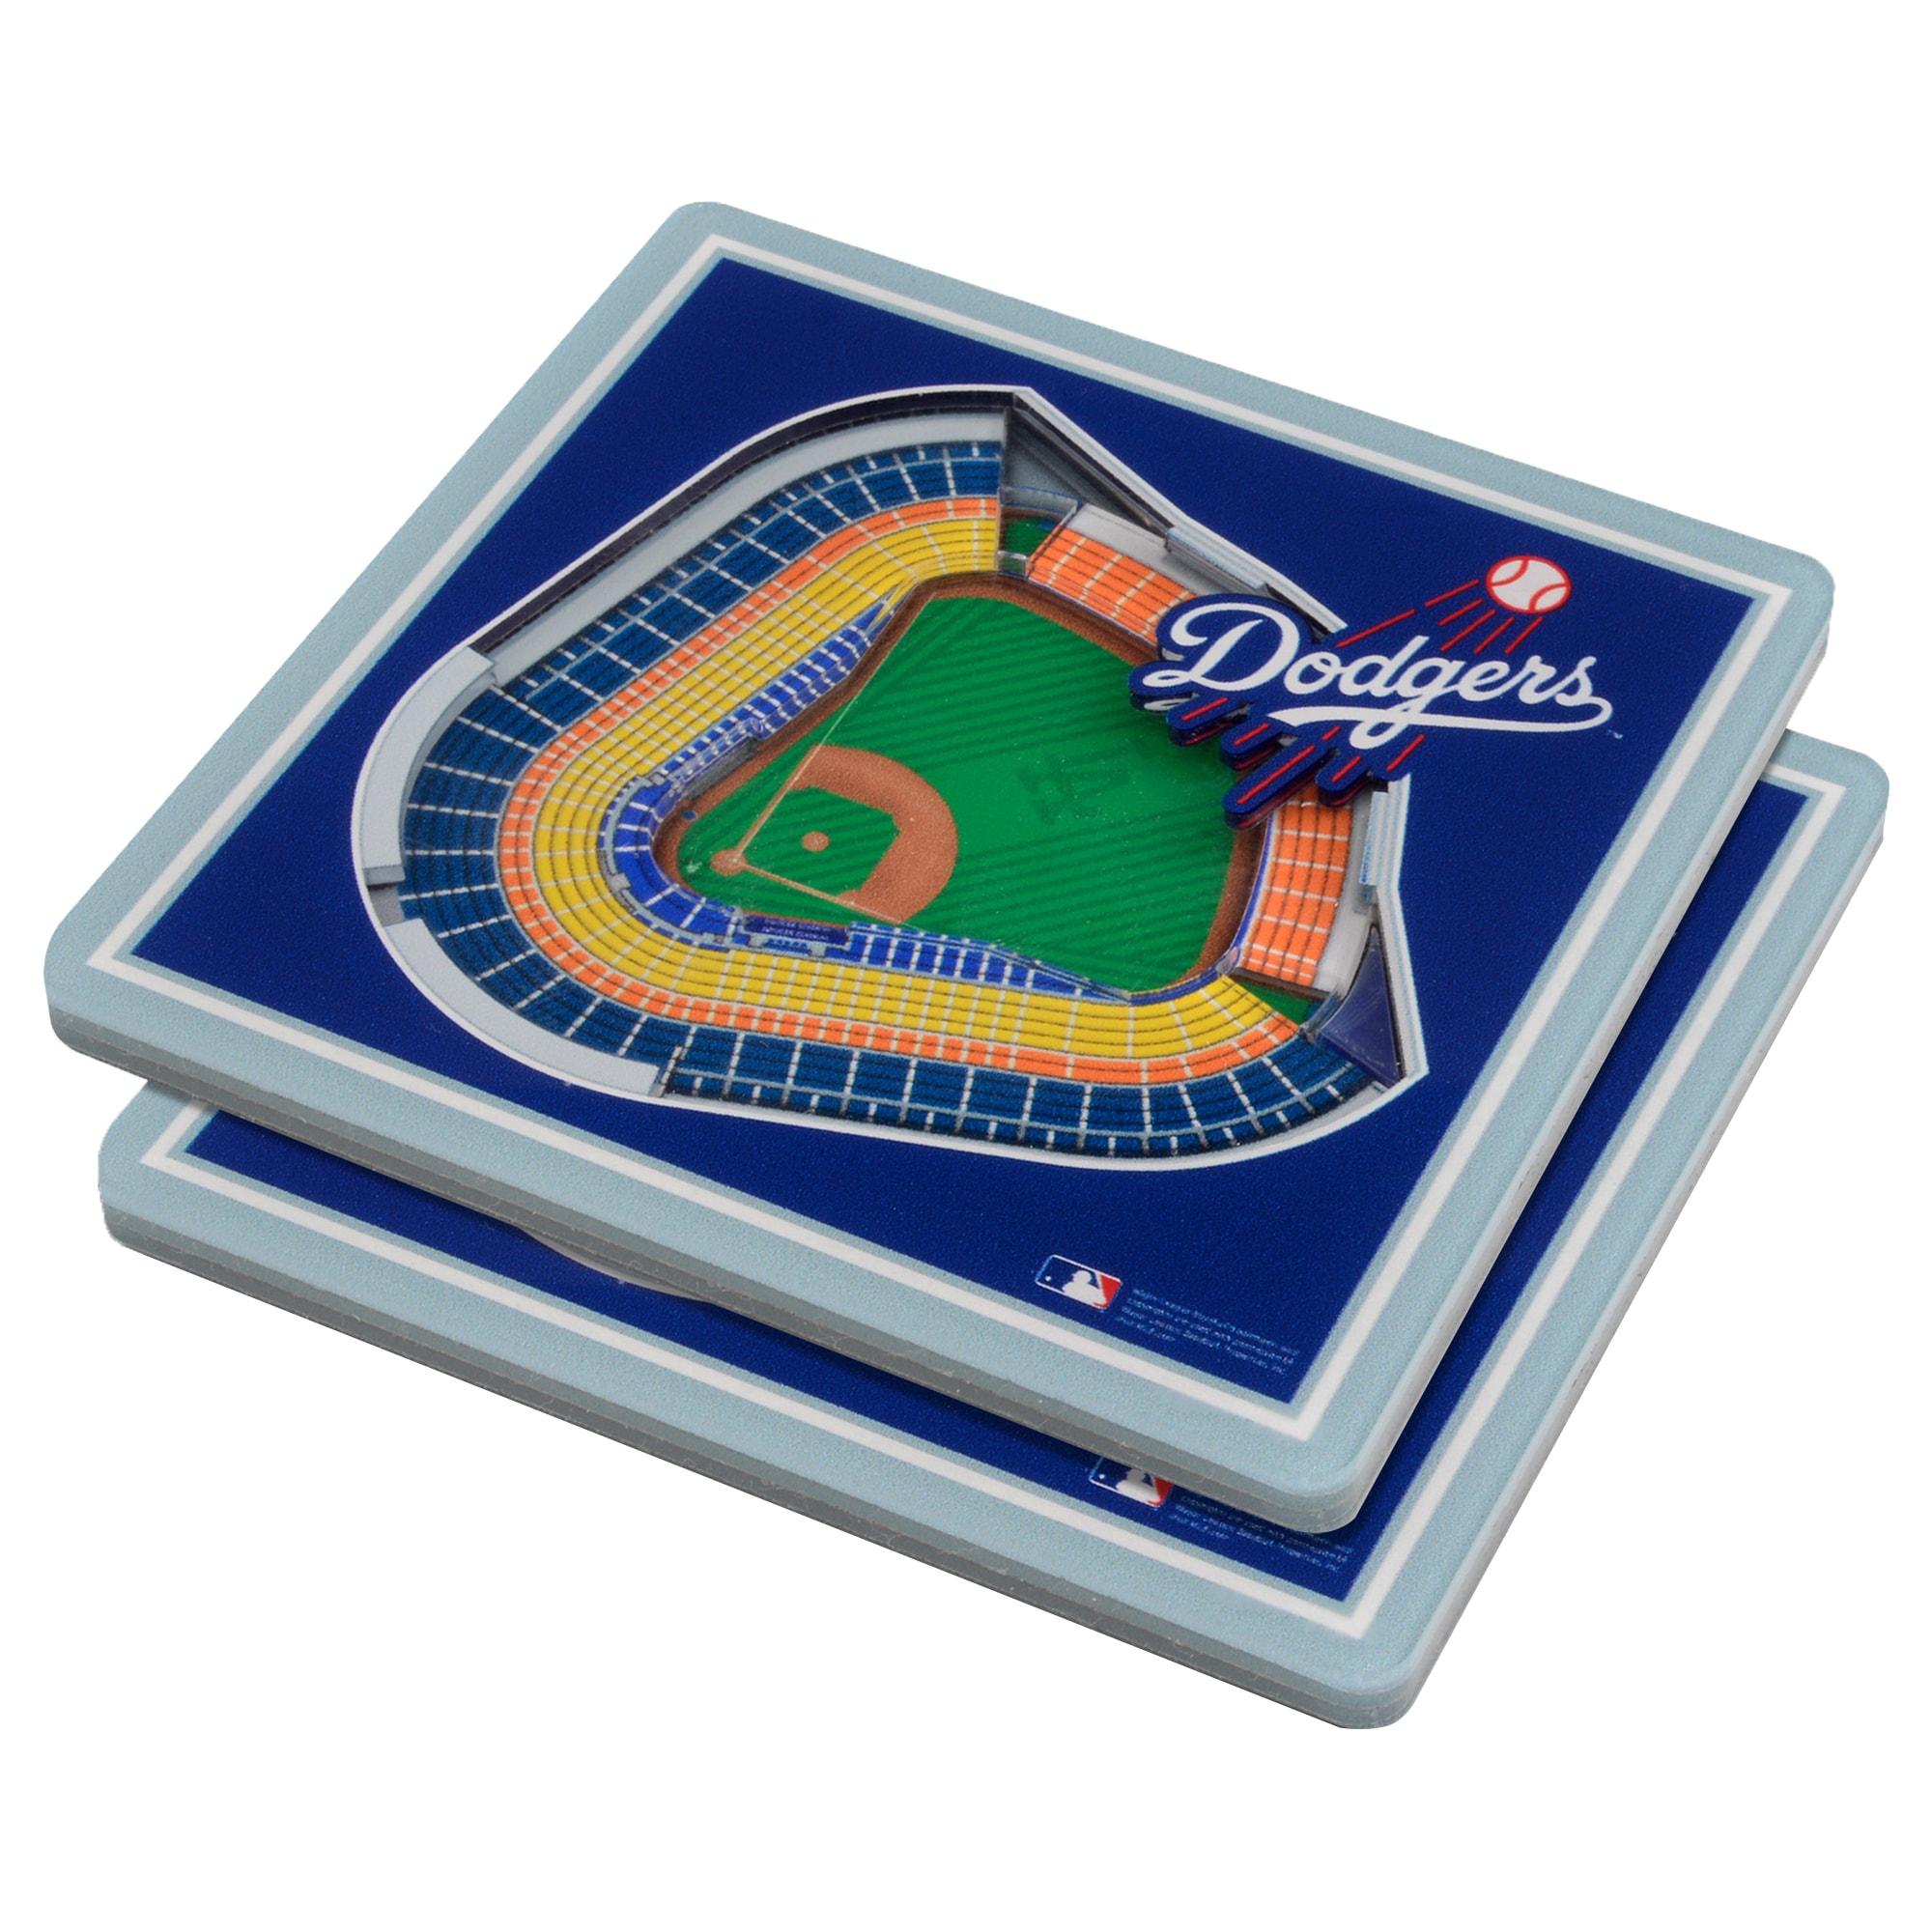 Los Angeles Dodgers 3D StadiumViews Coasters - Blue